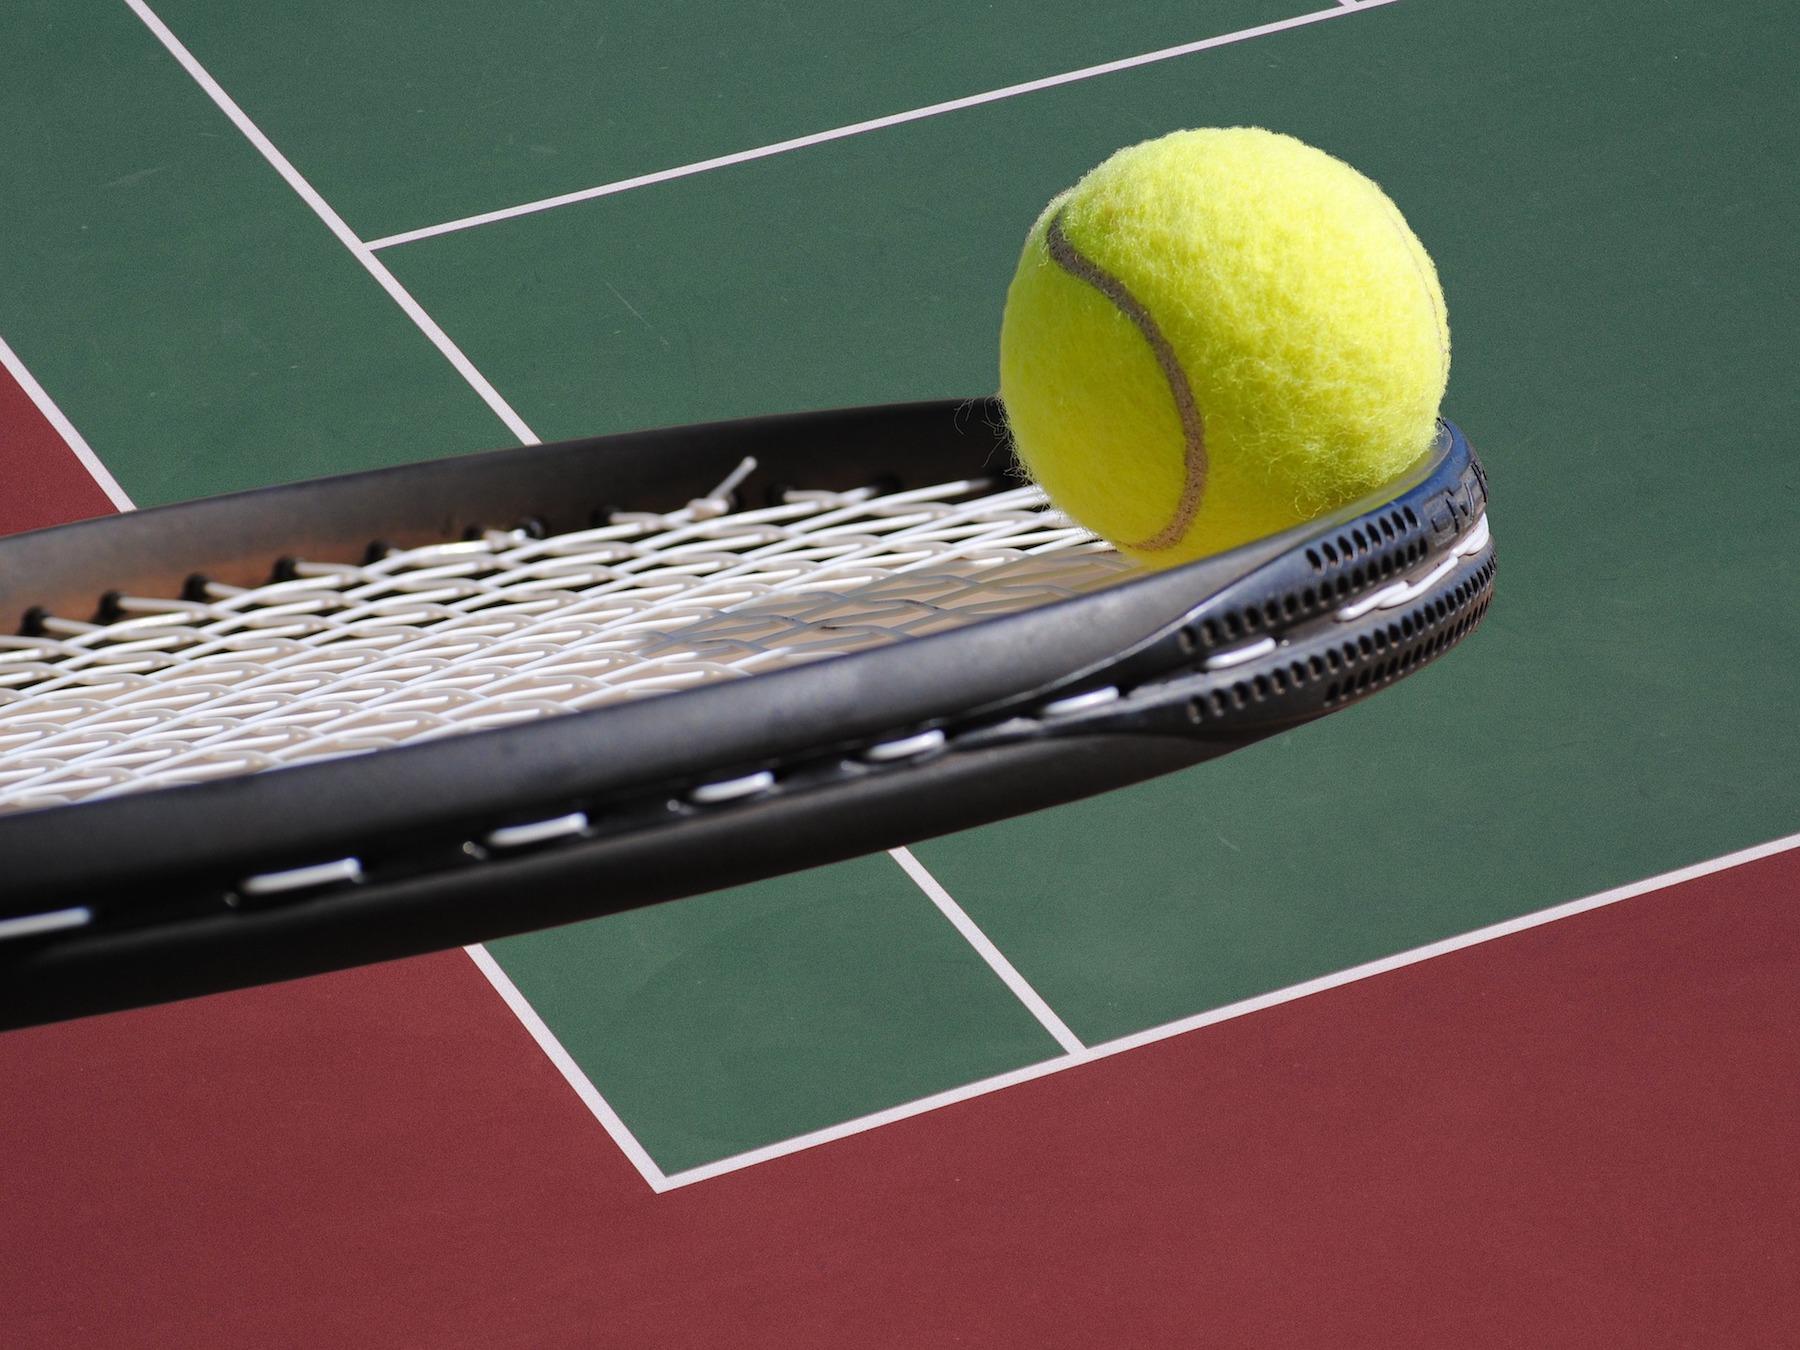 tennis-2819296 1920